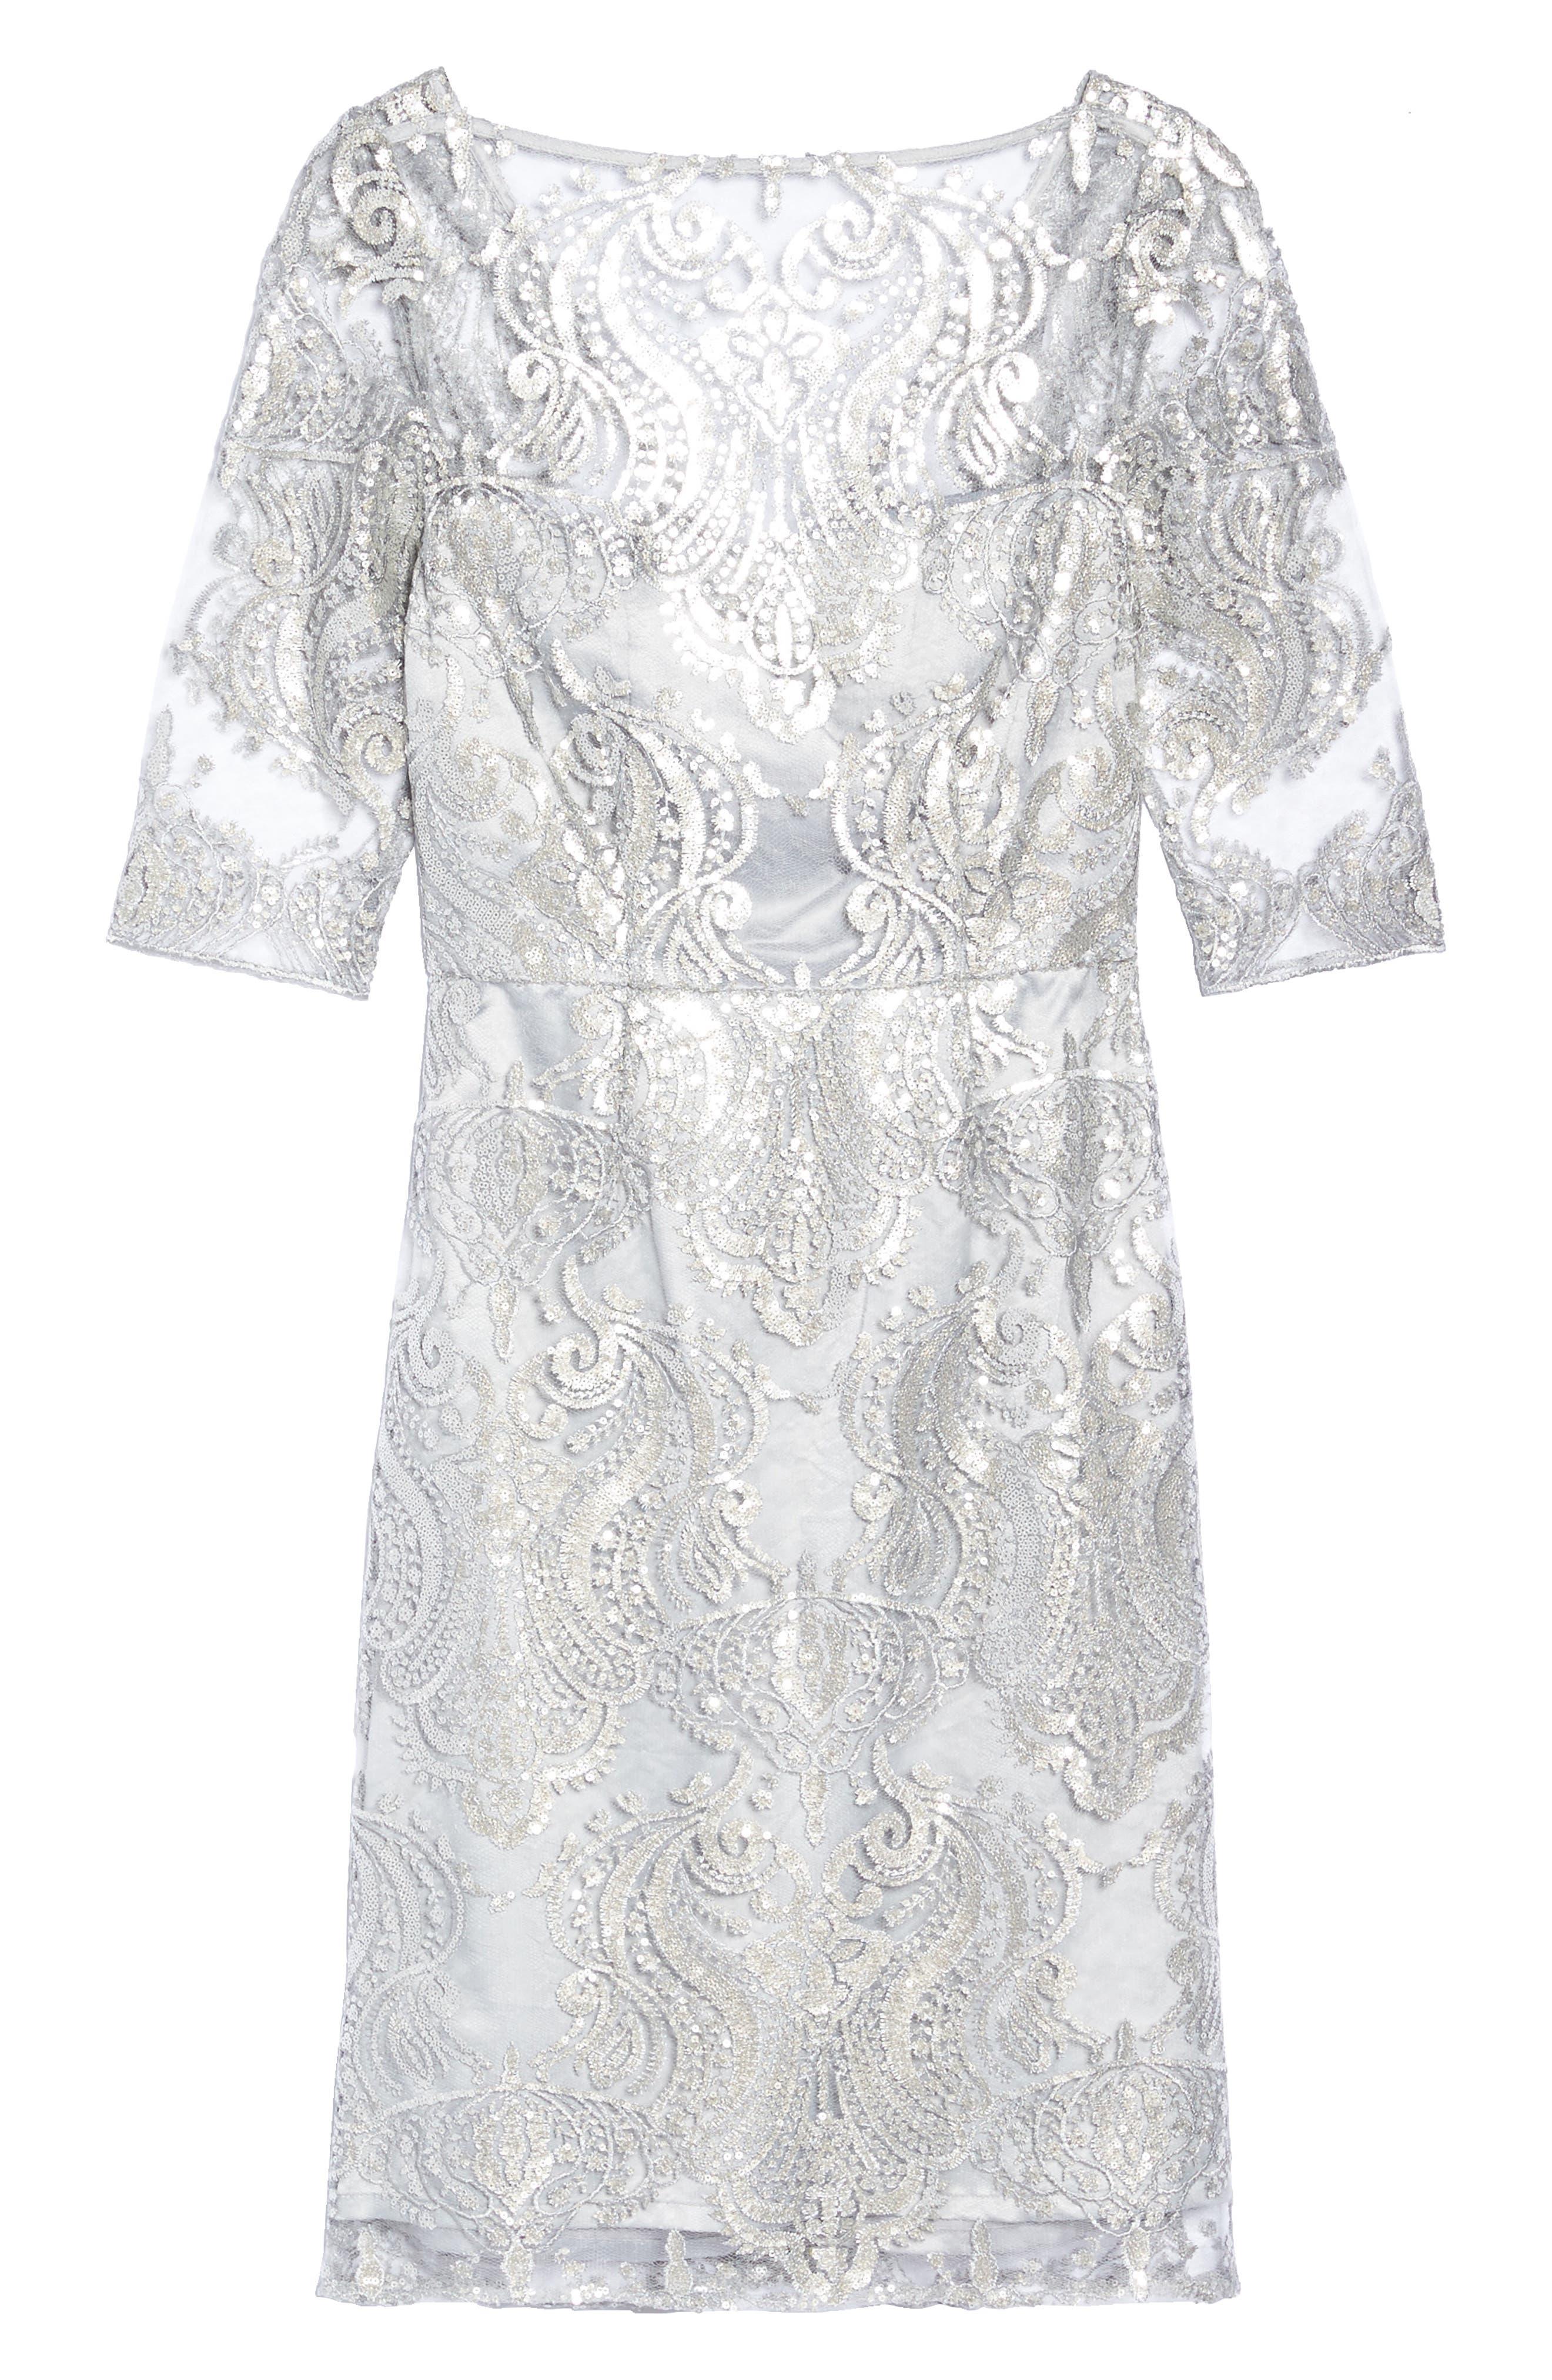 Sequin Illusion Sheath Dress,                             Main thumbnail 1, color,                             Silver